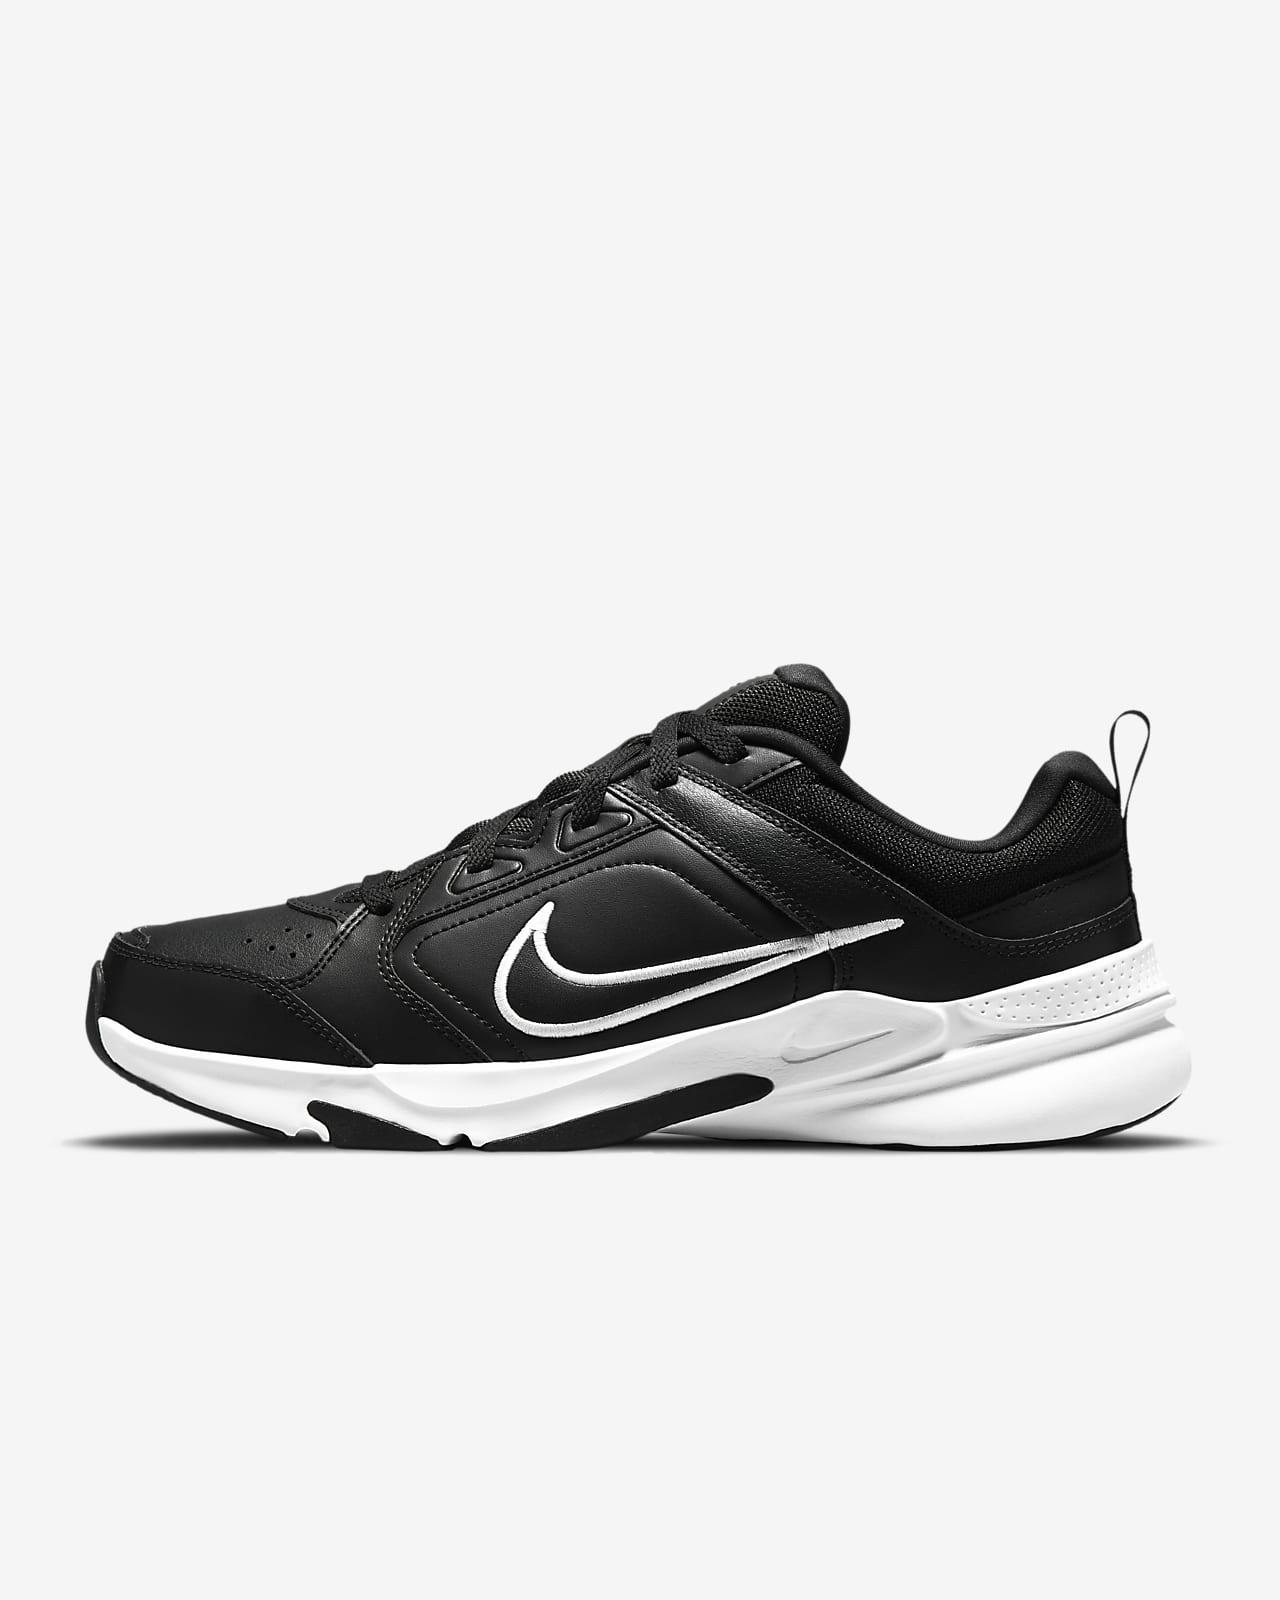 Calzado de entrenamiento para hombre Nike Defy All Day